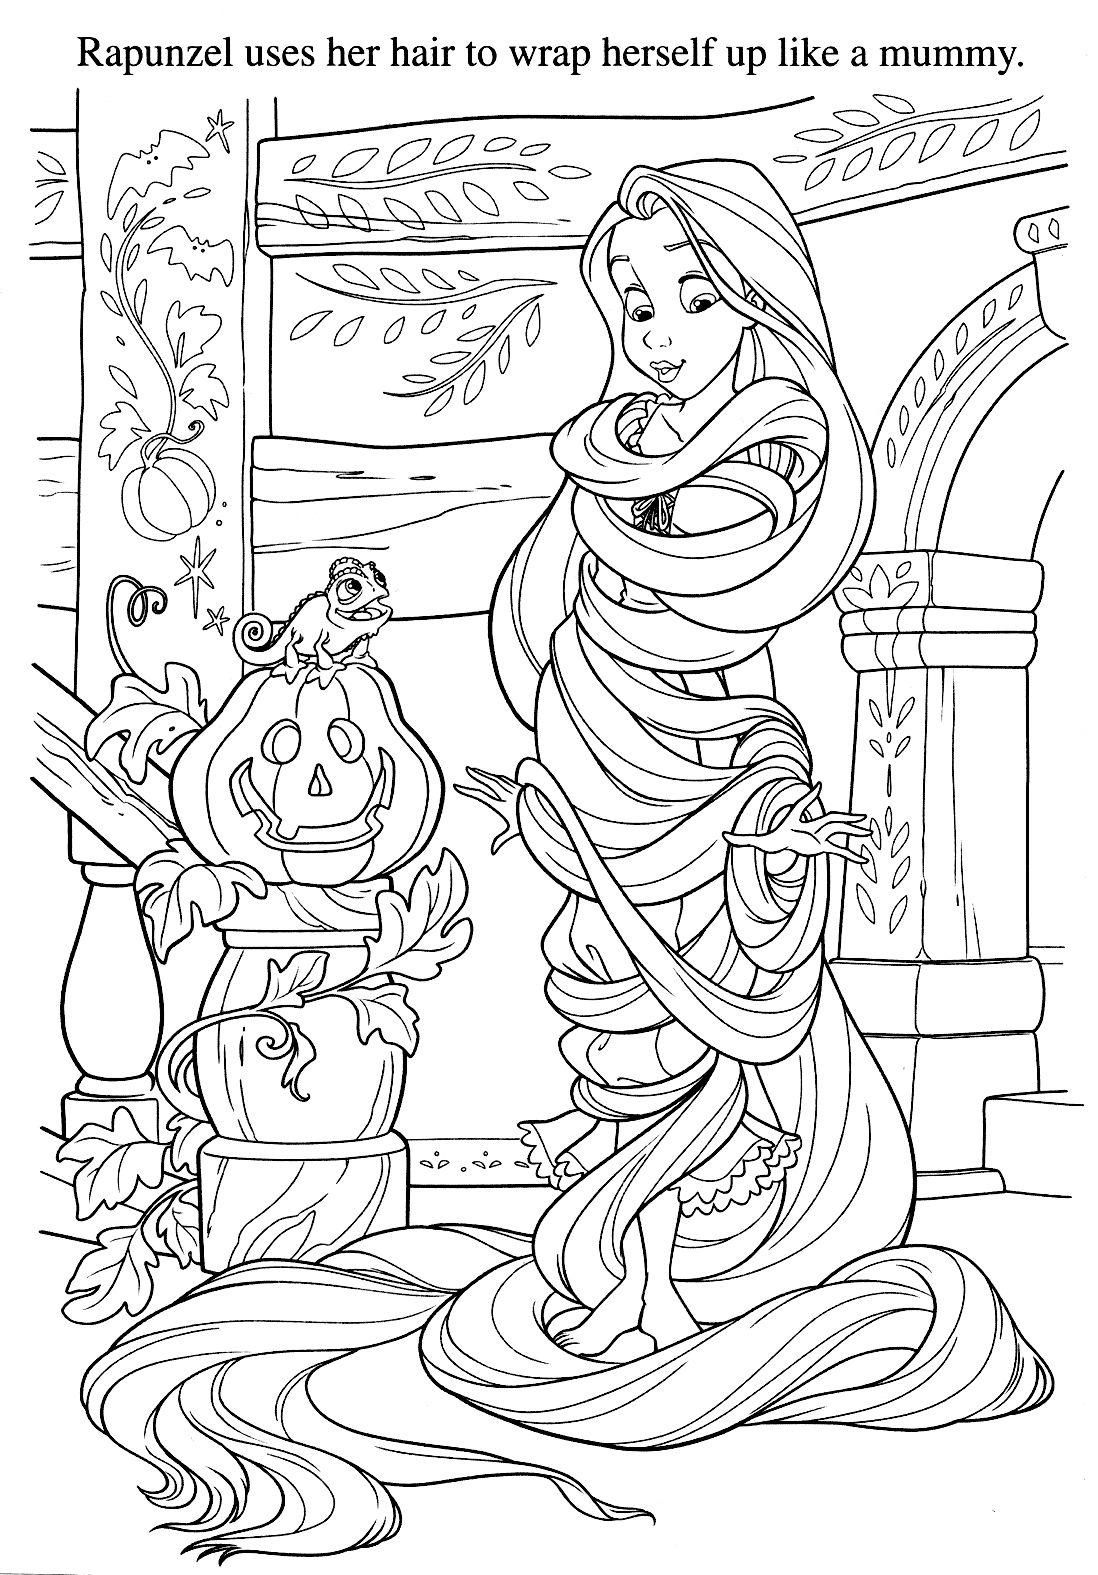 Disney Coloring Pages Disney Coloring Pages Tangled Coloring Pages Rapunzel Coloring Pages